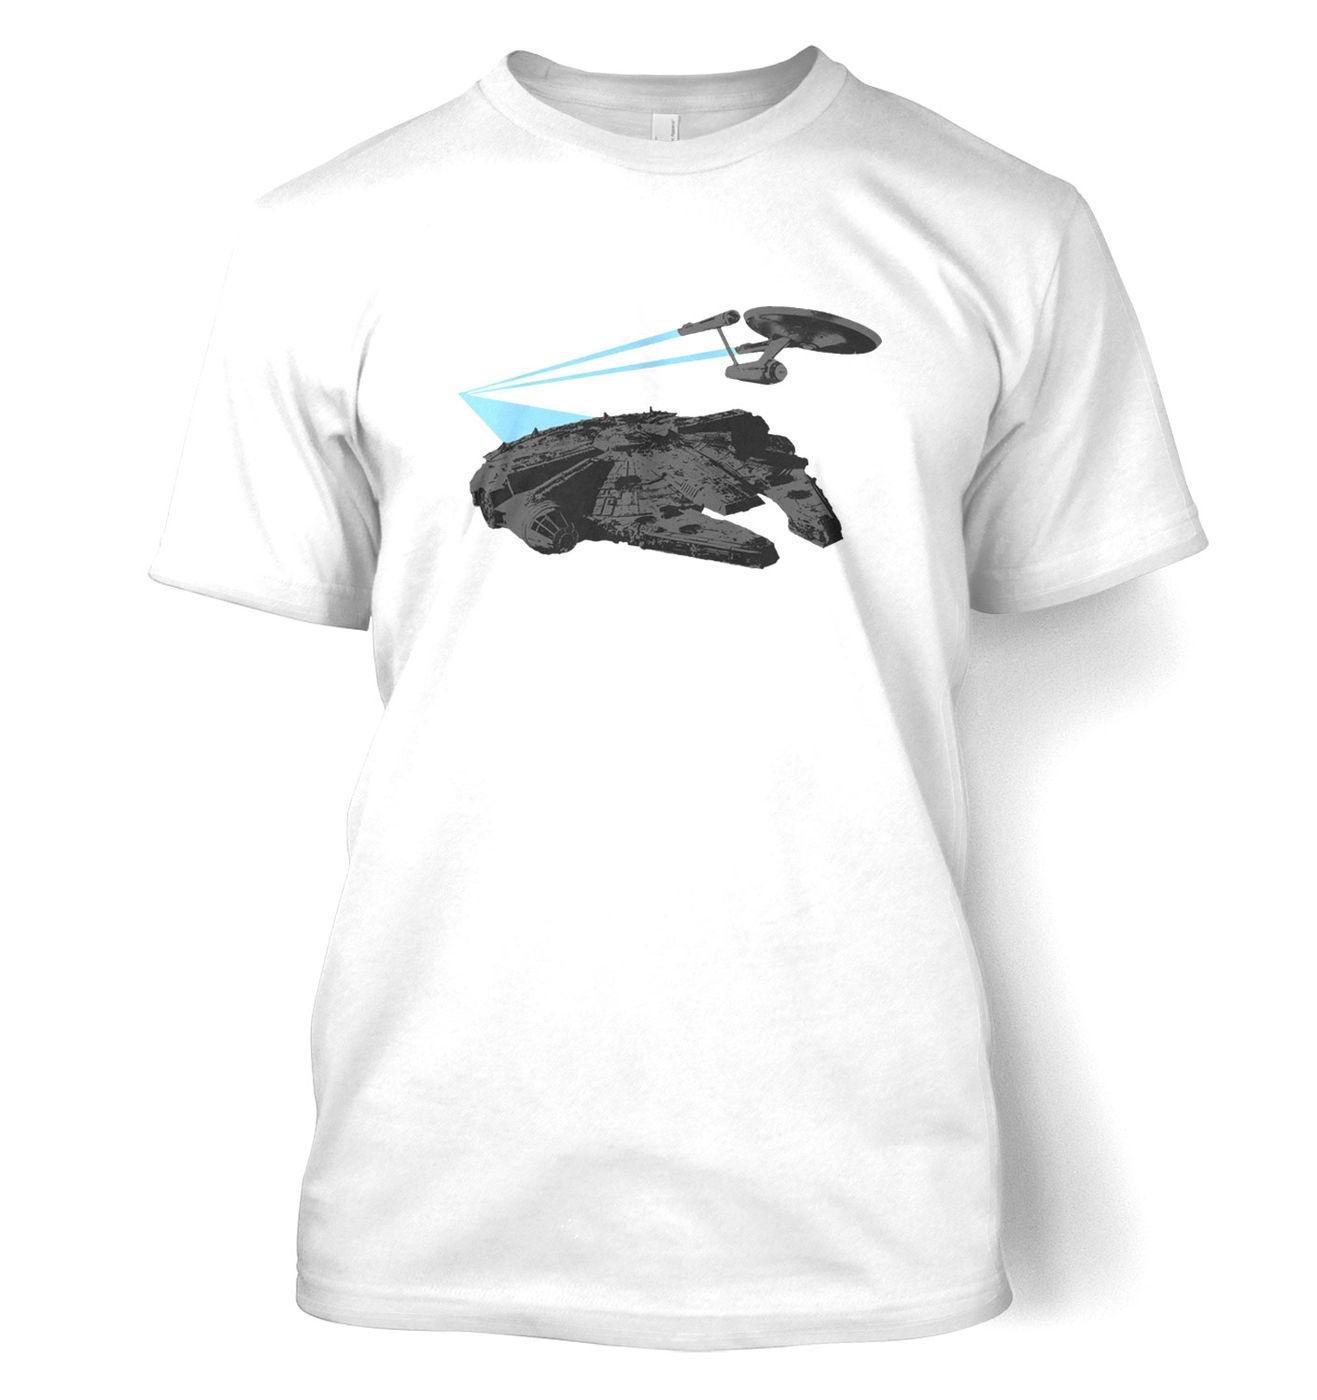 Falcon vs Enterprise t-shirt by Something Geeky